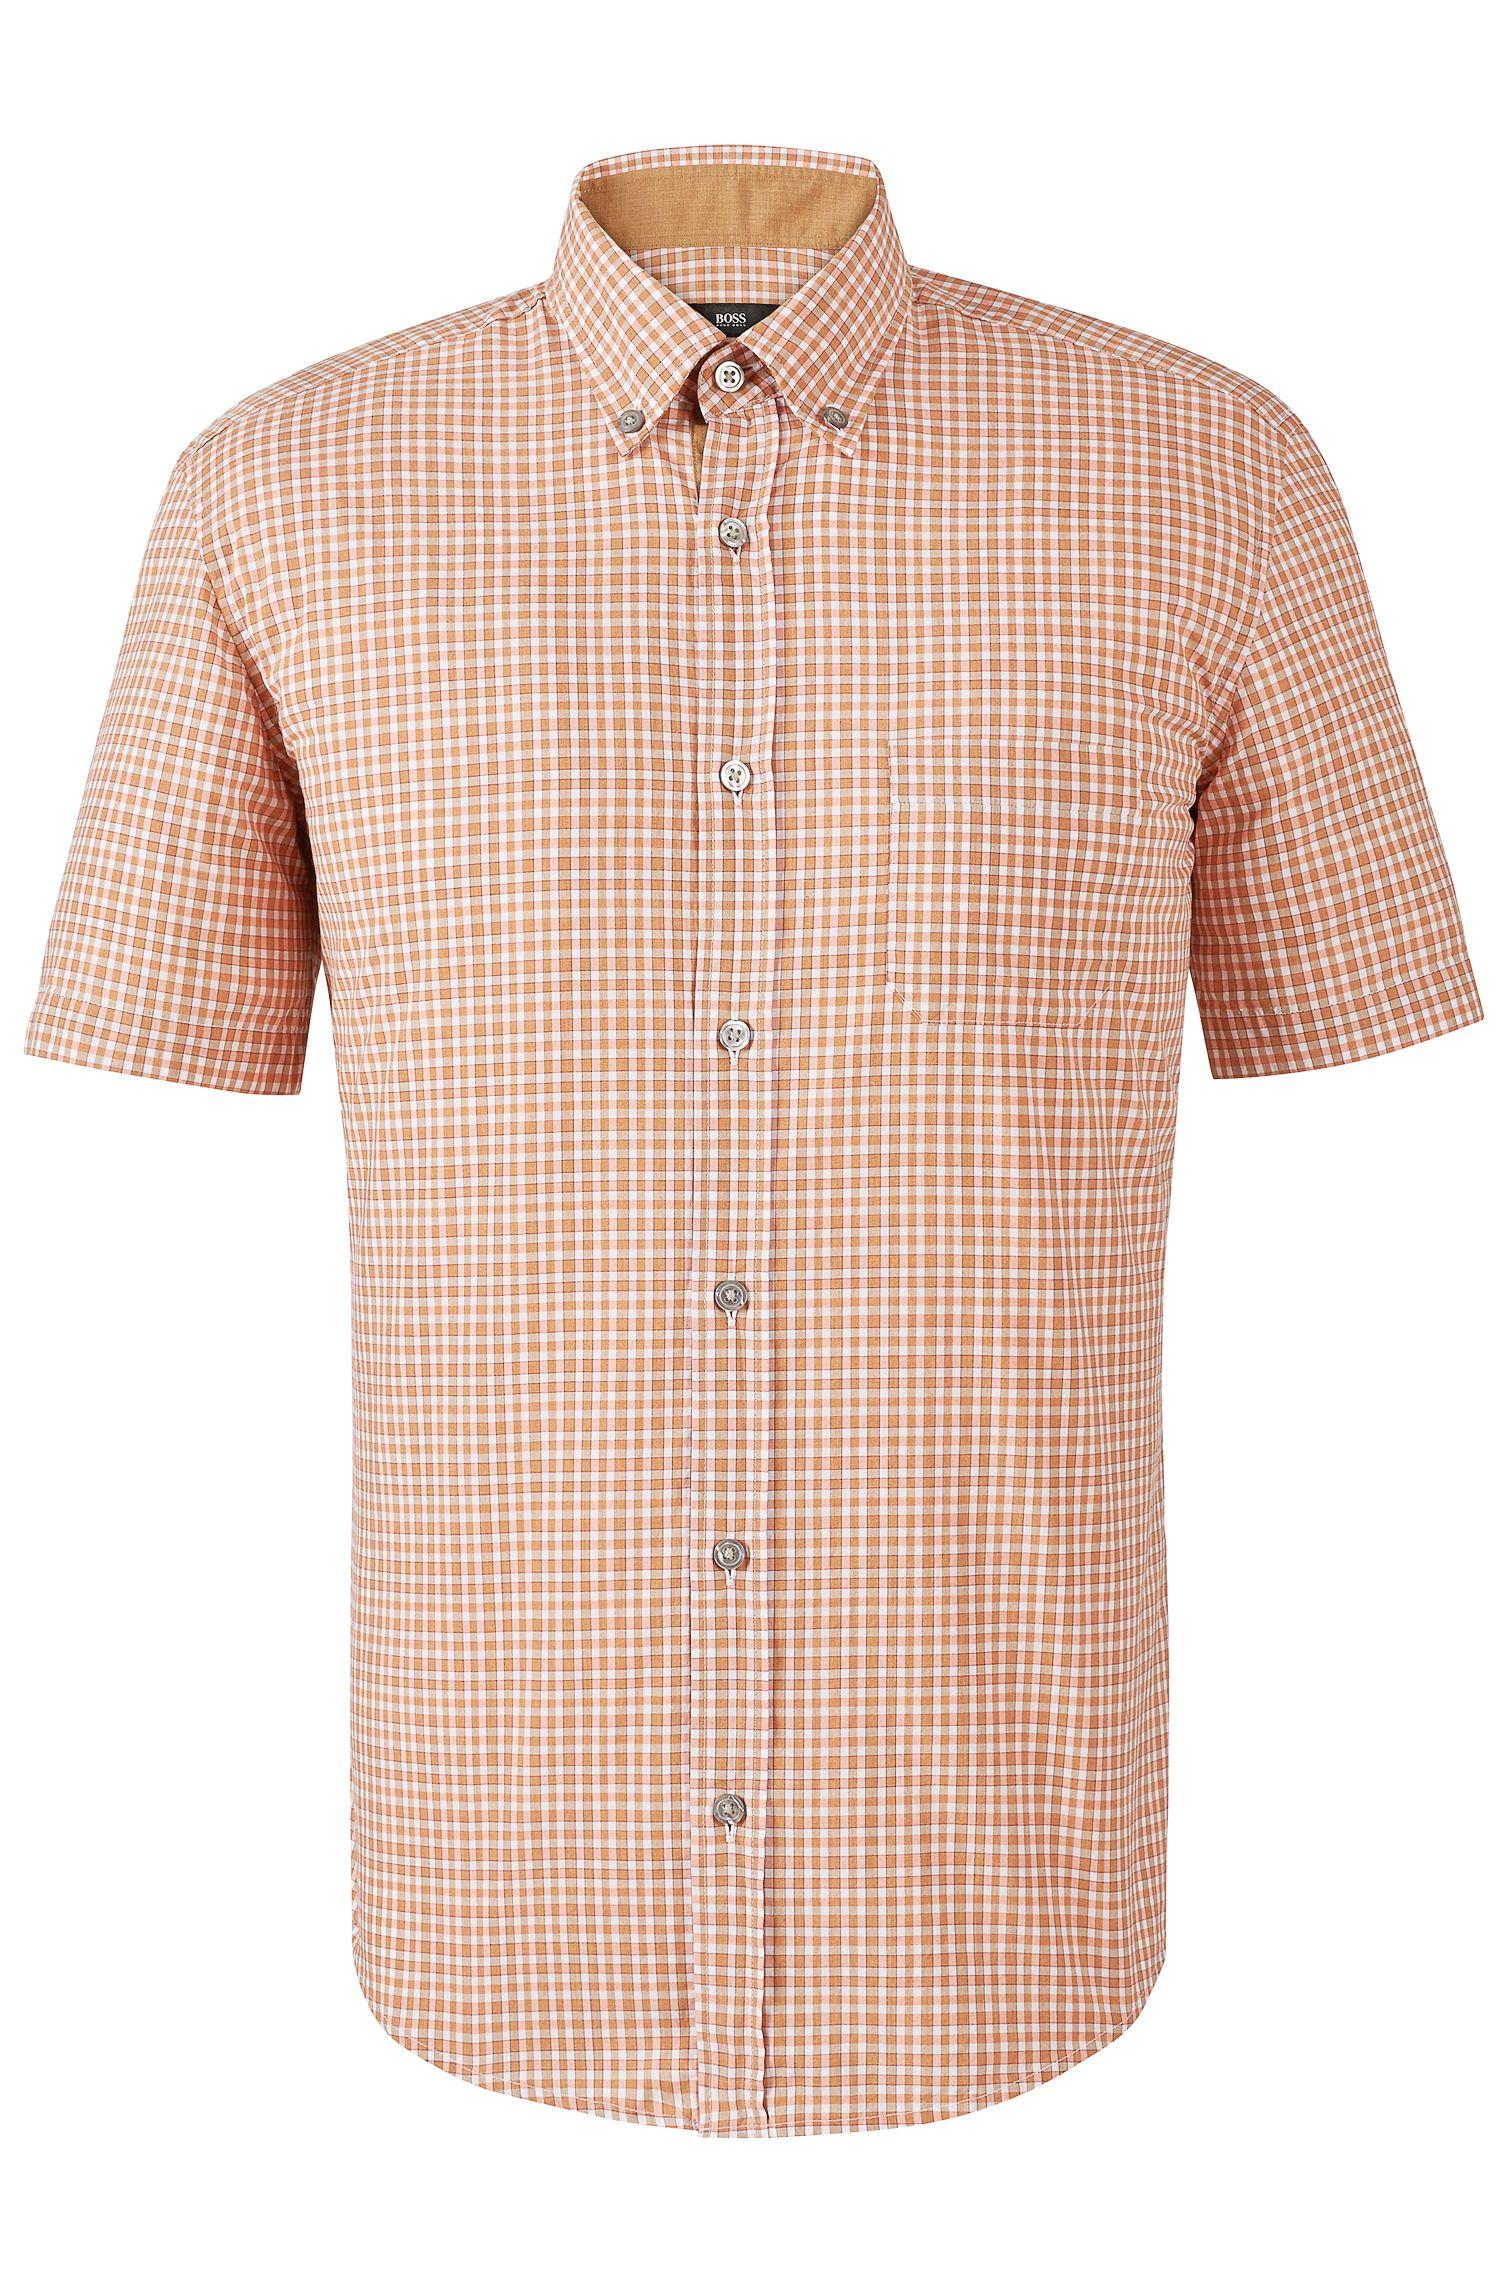 'Roddy P'   Slim Fit, Cotton Short Sleeve Button Down Shirt